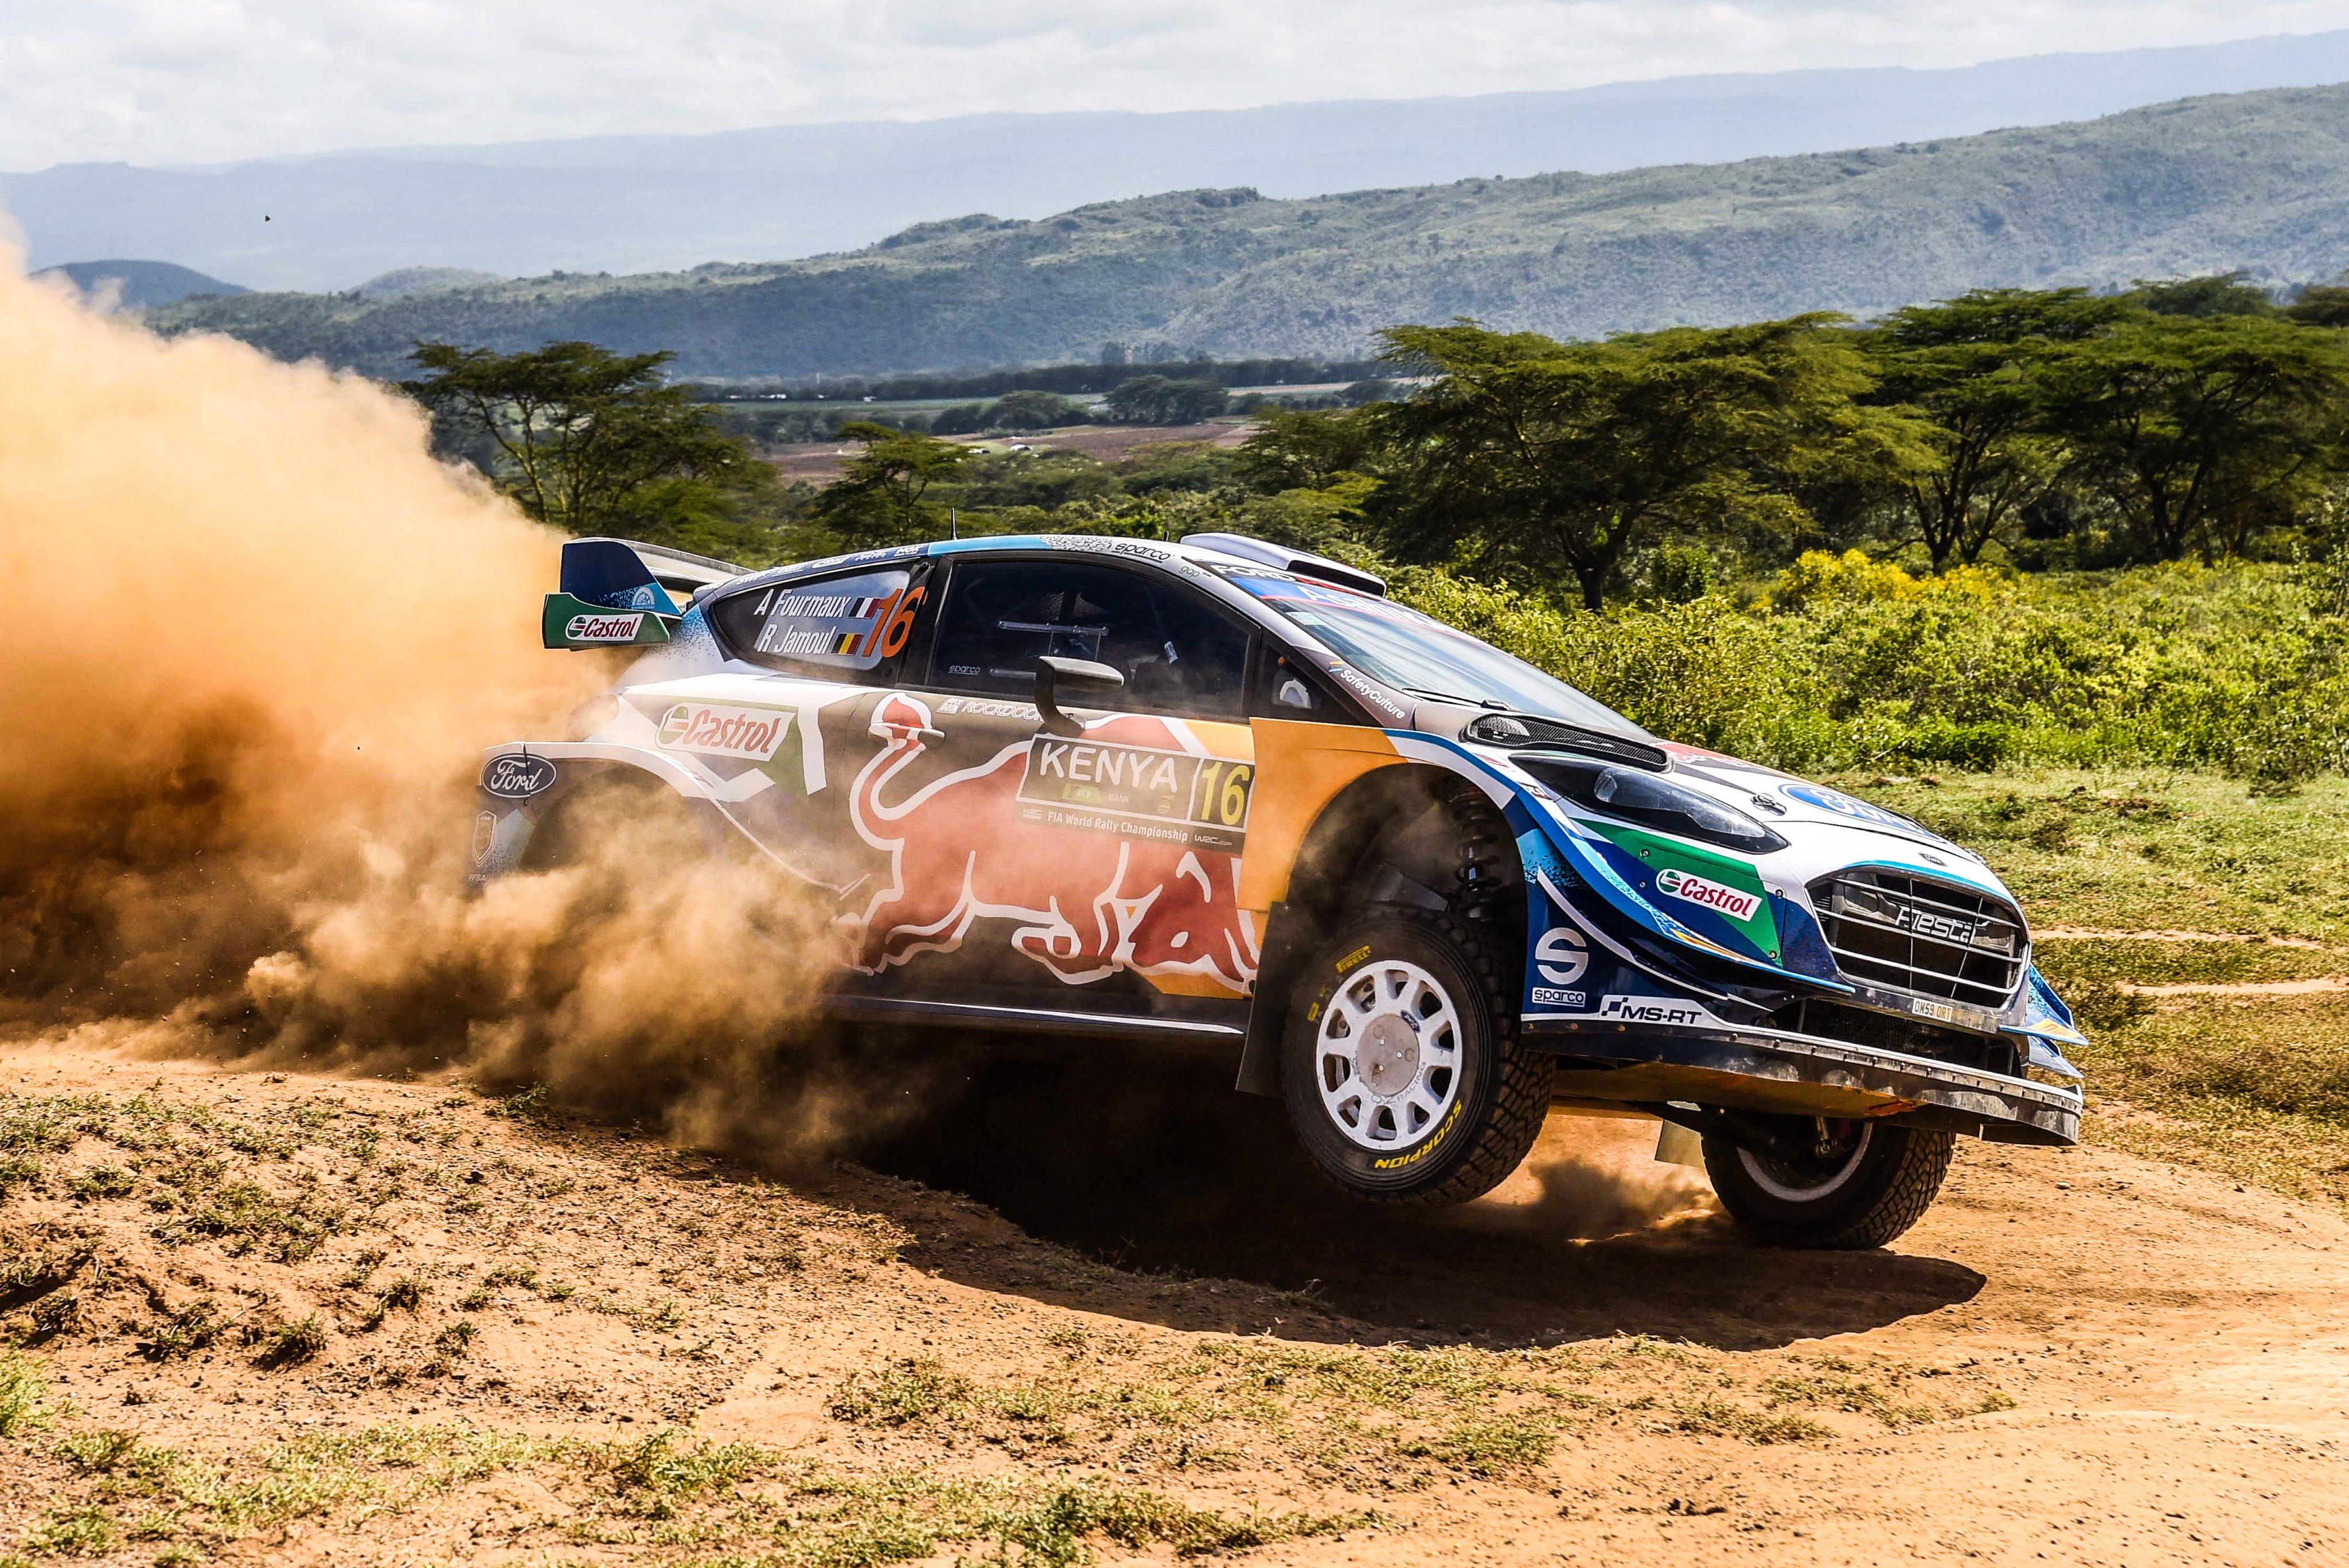 WRC: Safari Rally Kenya [23-27 Junio] - Página 4 E4ubameX0AQDaZ2?format=jpg&name=4096x4096